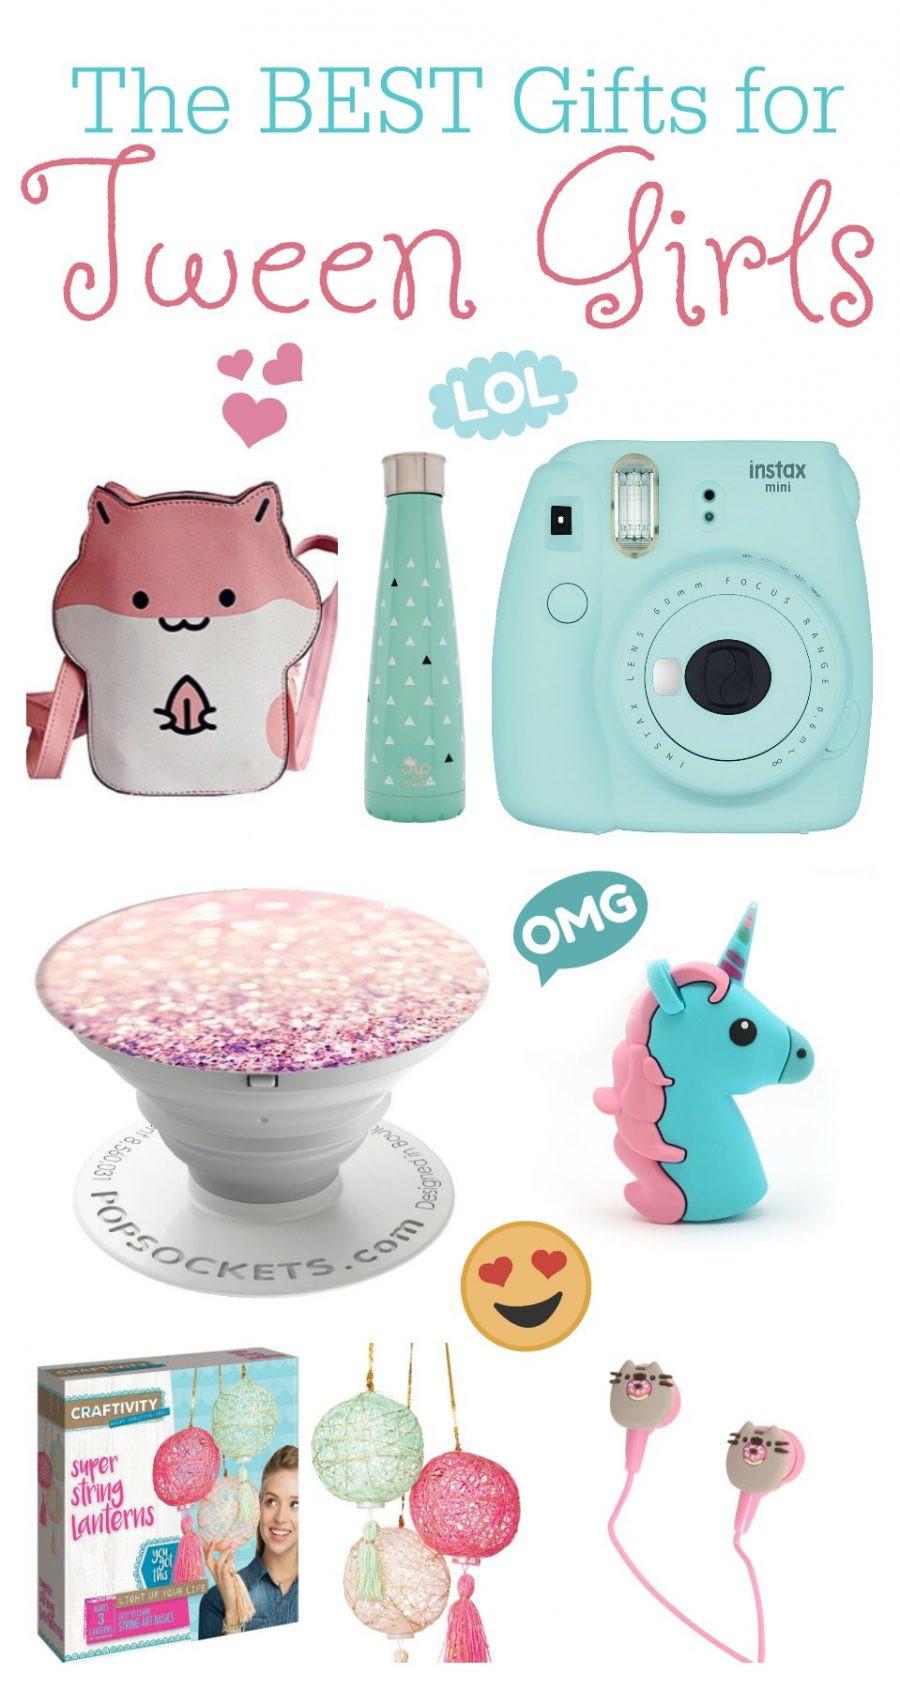 Best Gift Ideas For Girls  The BEST Gift Ideas for Tween Girls